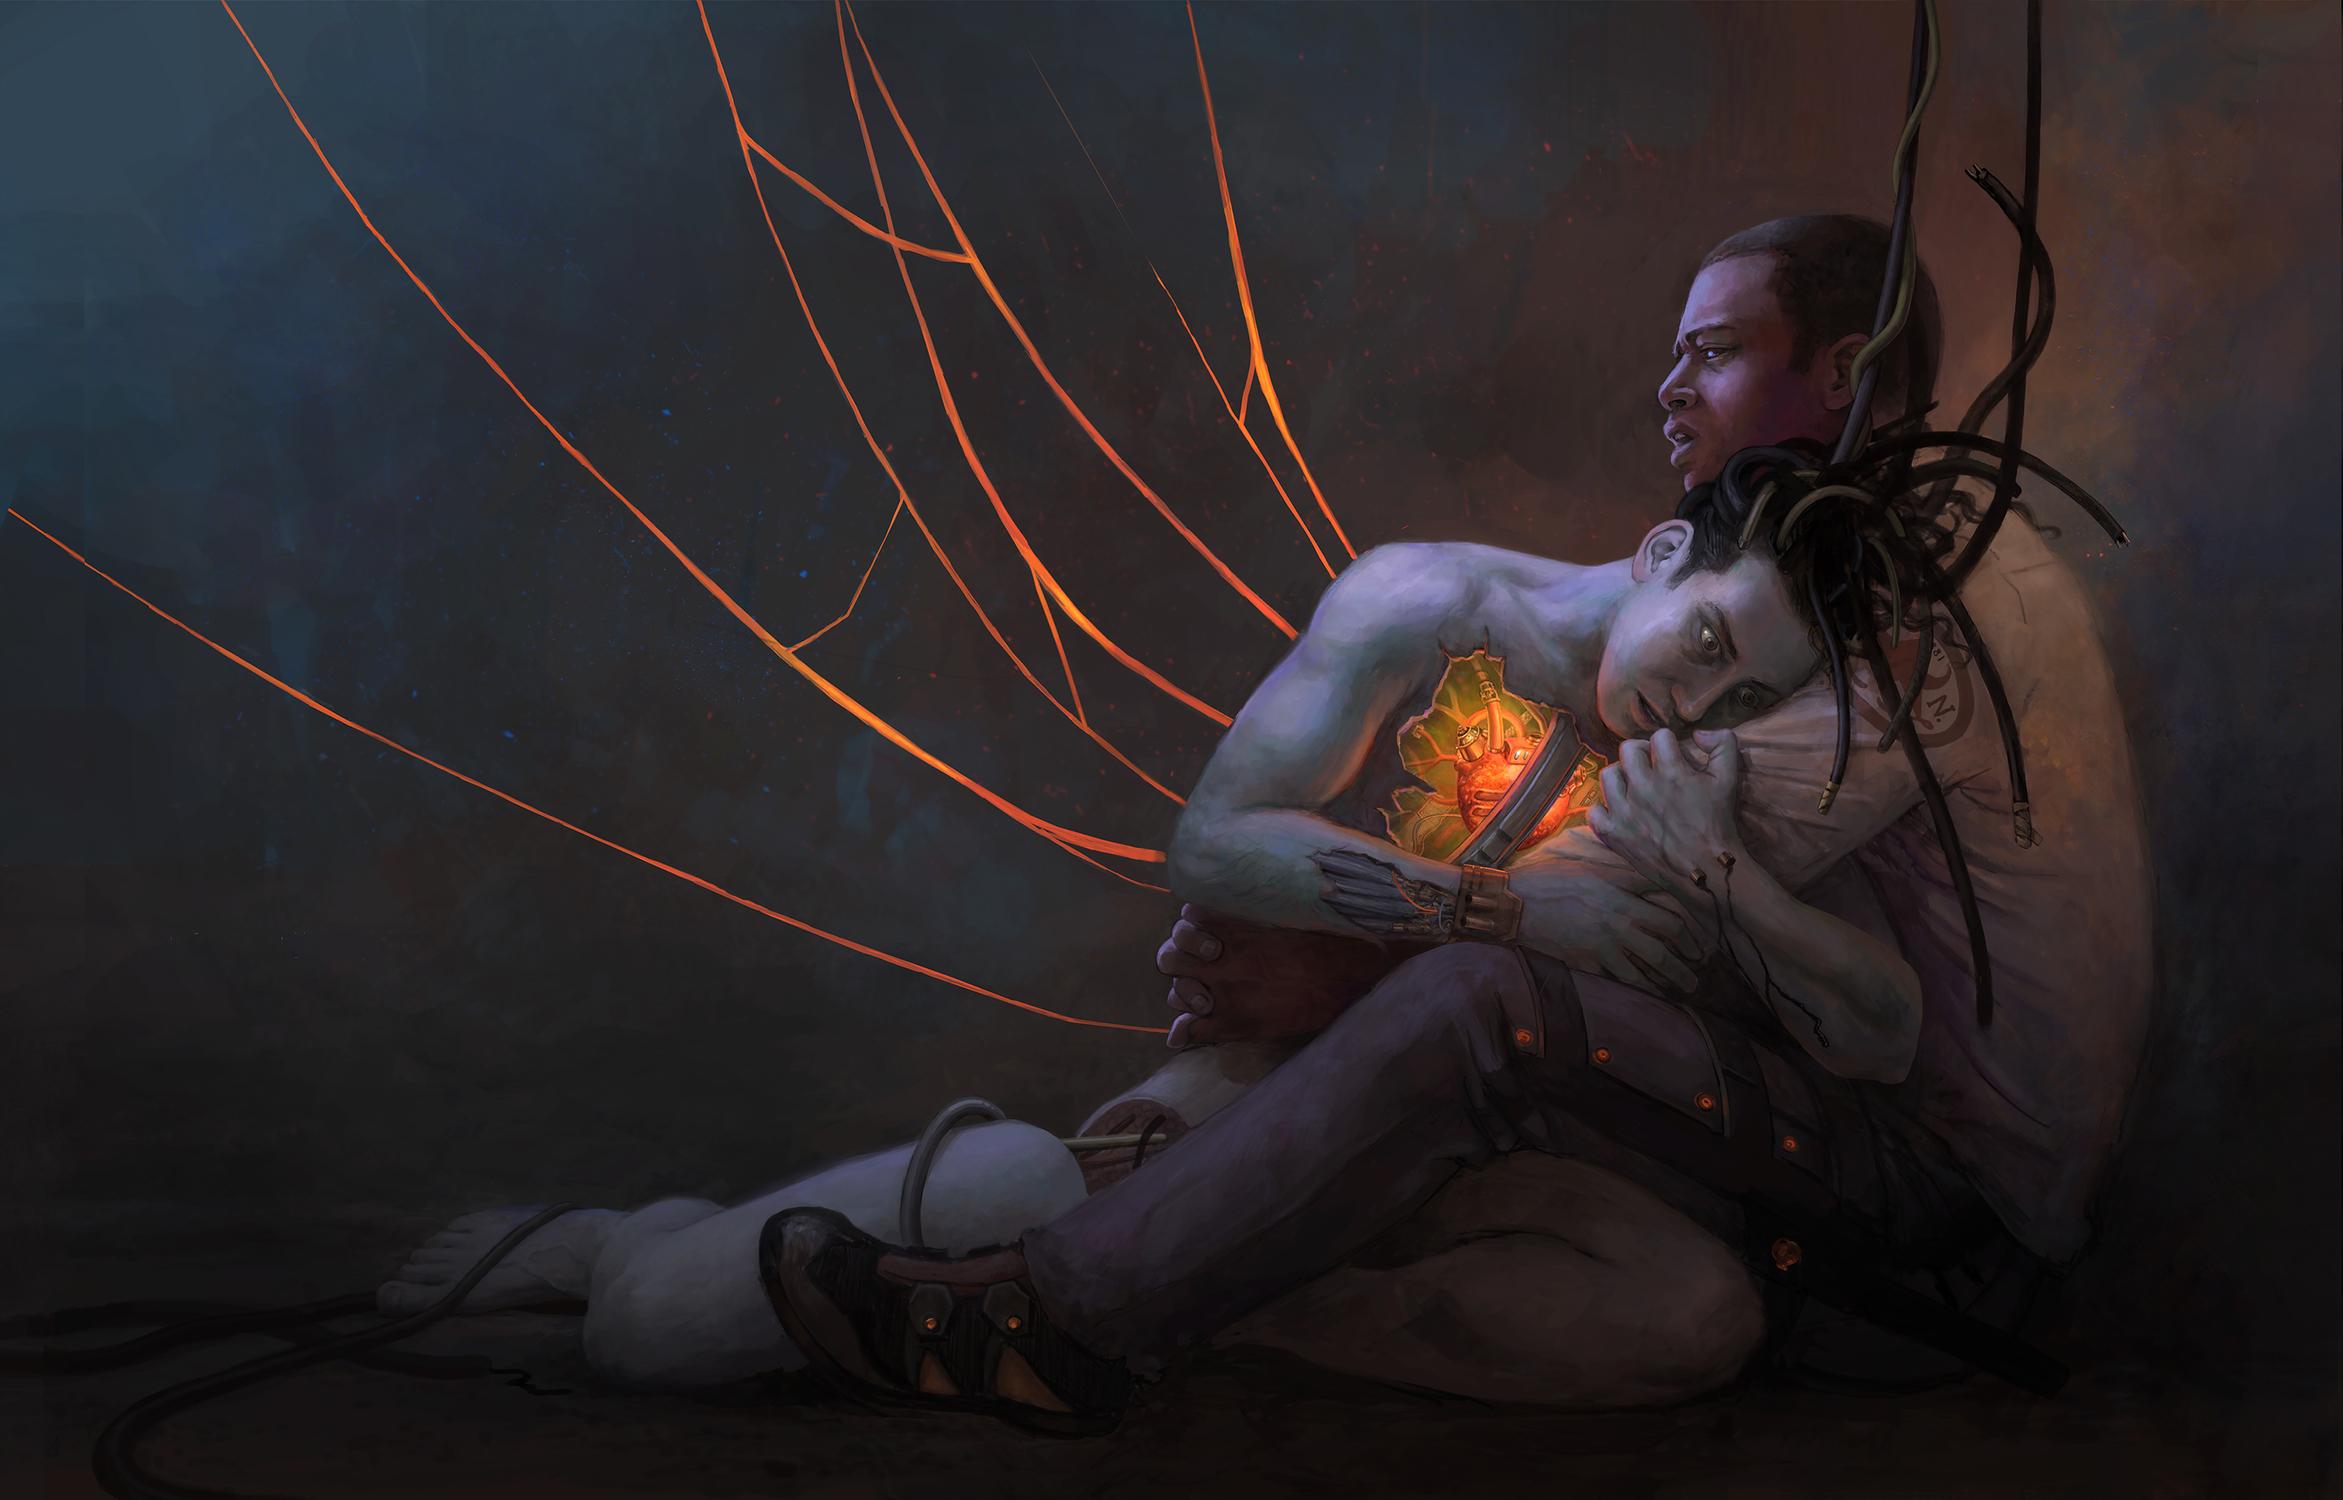 Backbone Practise I Artwork by Stella Spente